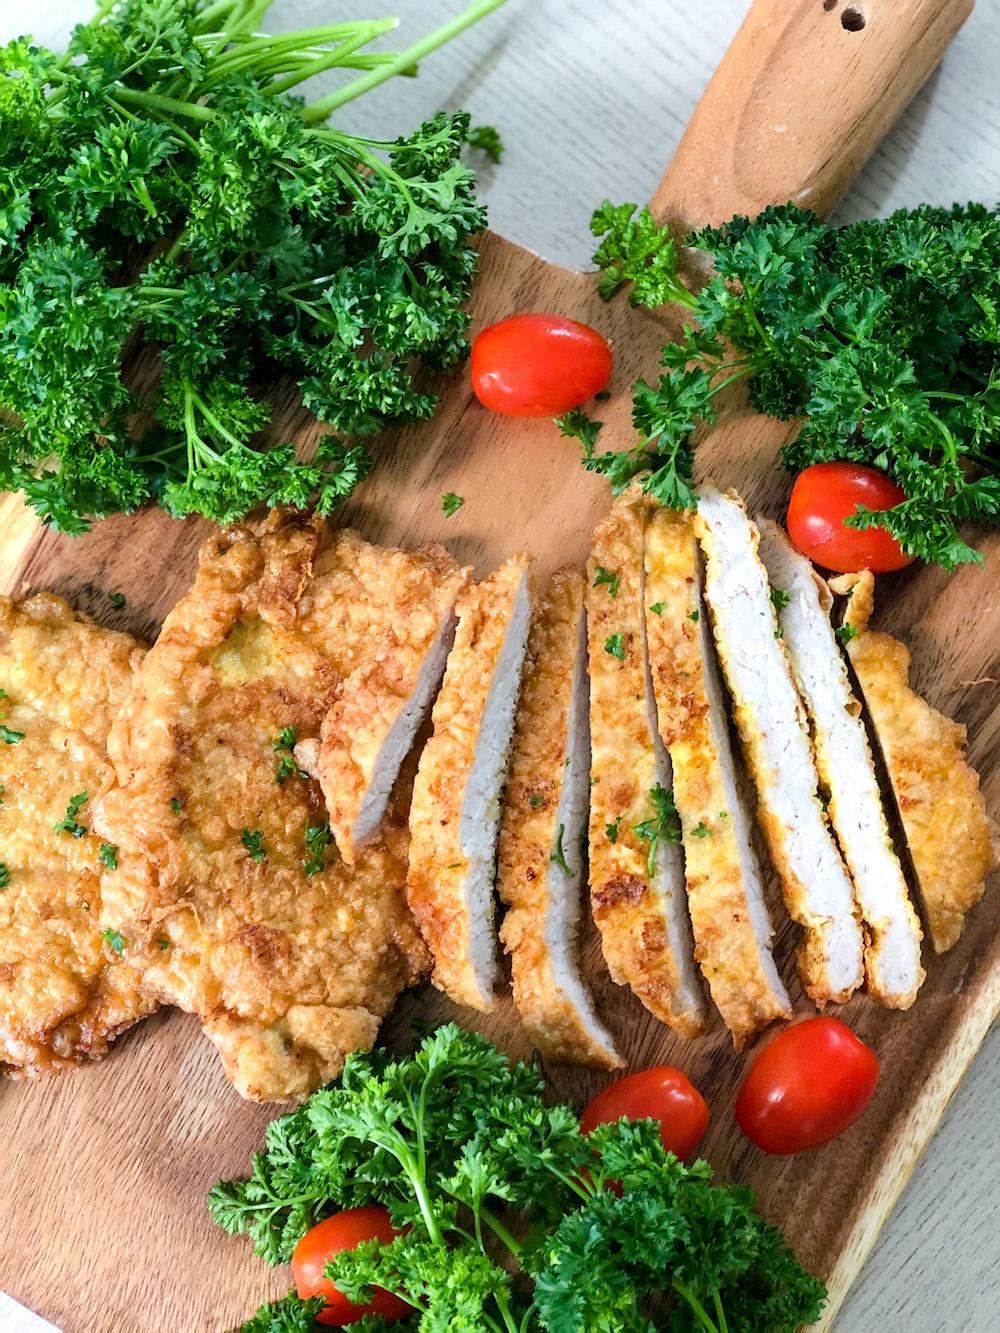 Pork Schnitzel - Cutlets